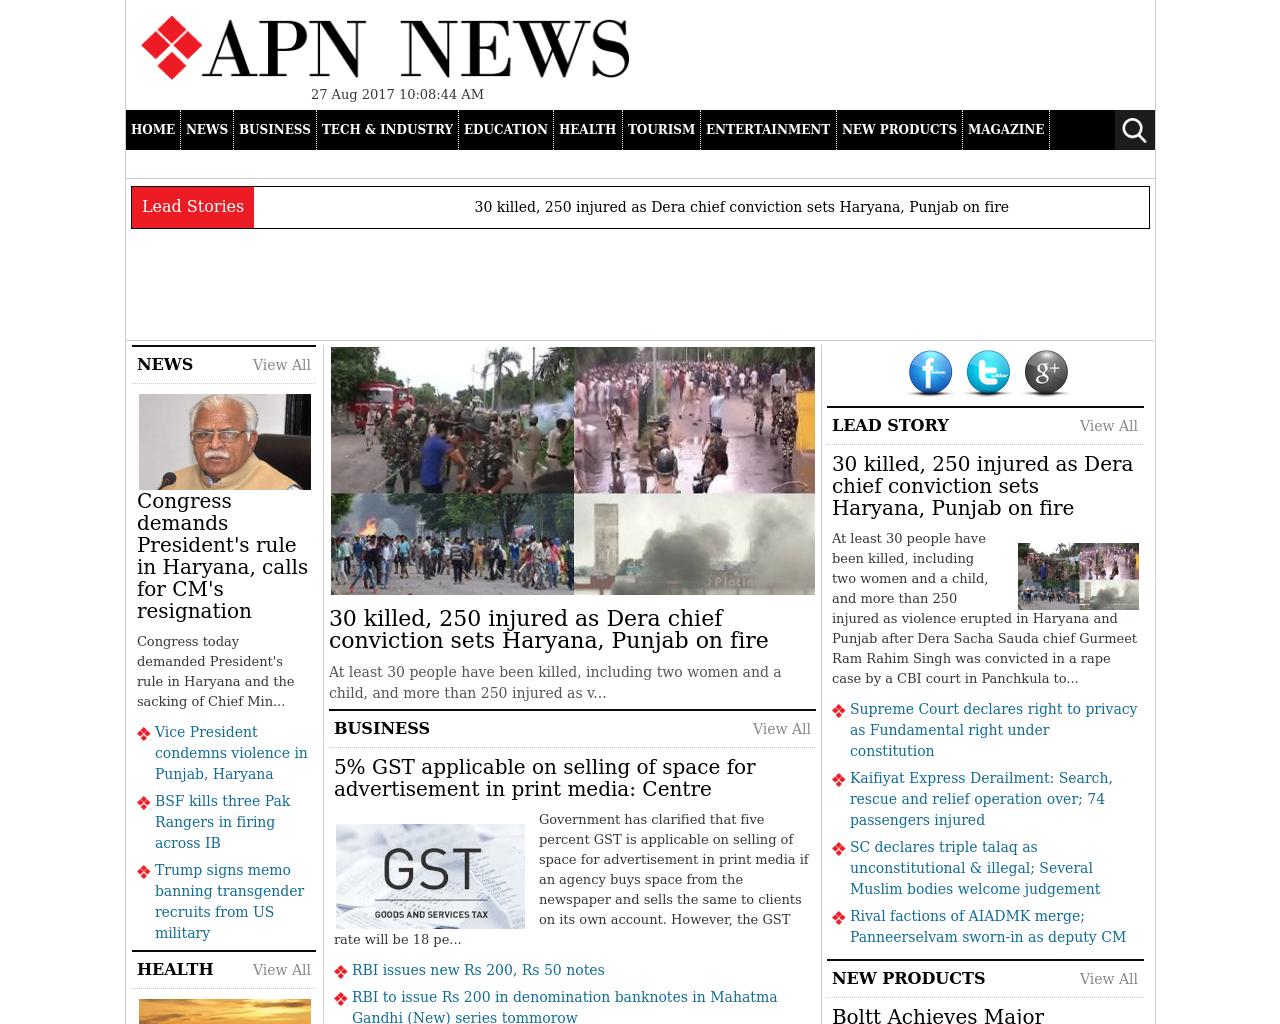 APN-News-Advertising-Reviews-Pricing